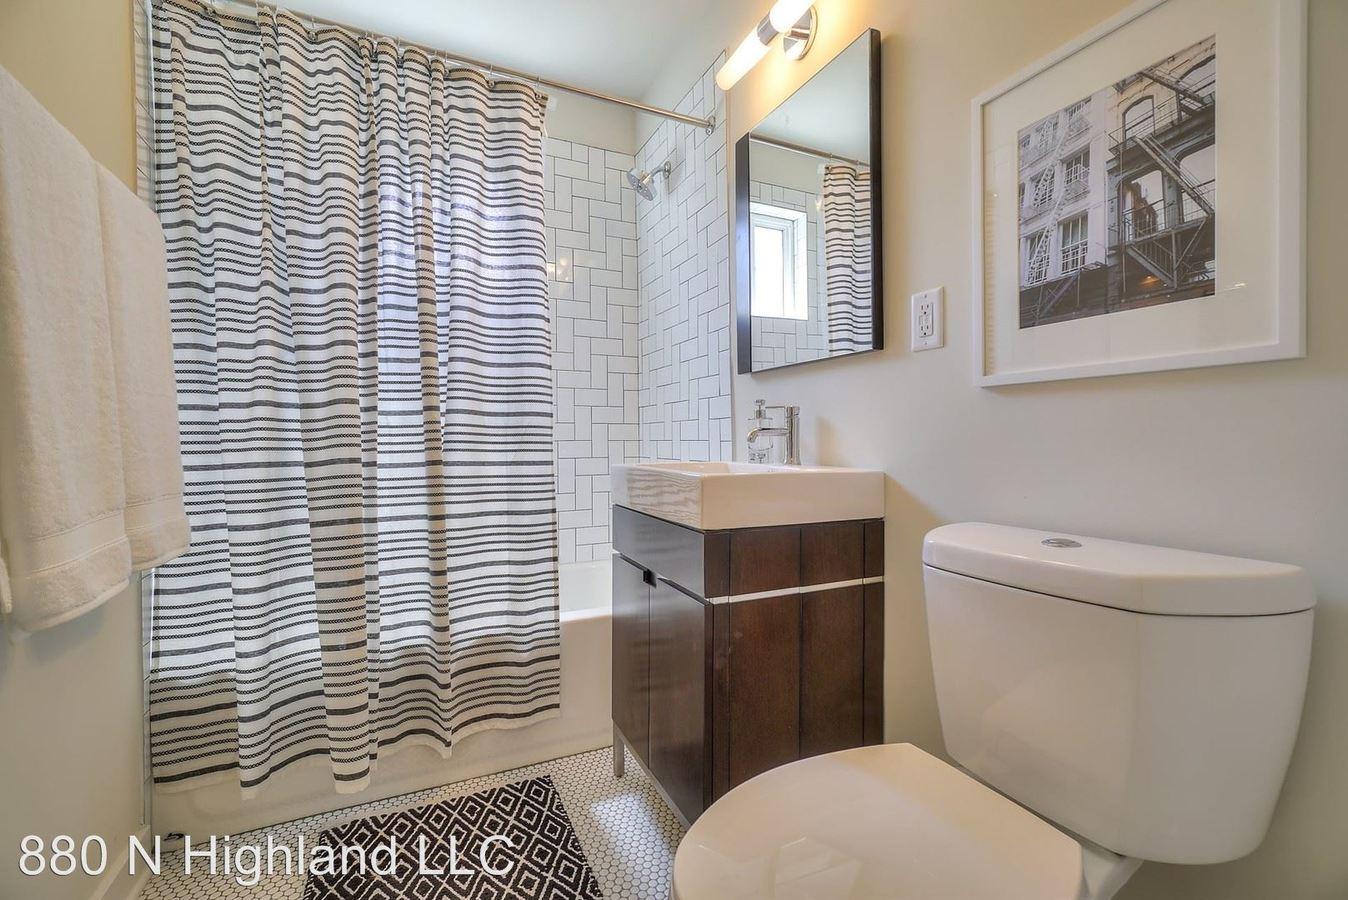 1 Bedroom 1 Bathroom Apartment for rent at 880 North Highland Ave Ne in Atlanta, GA